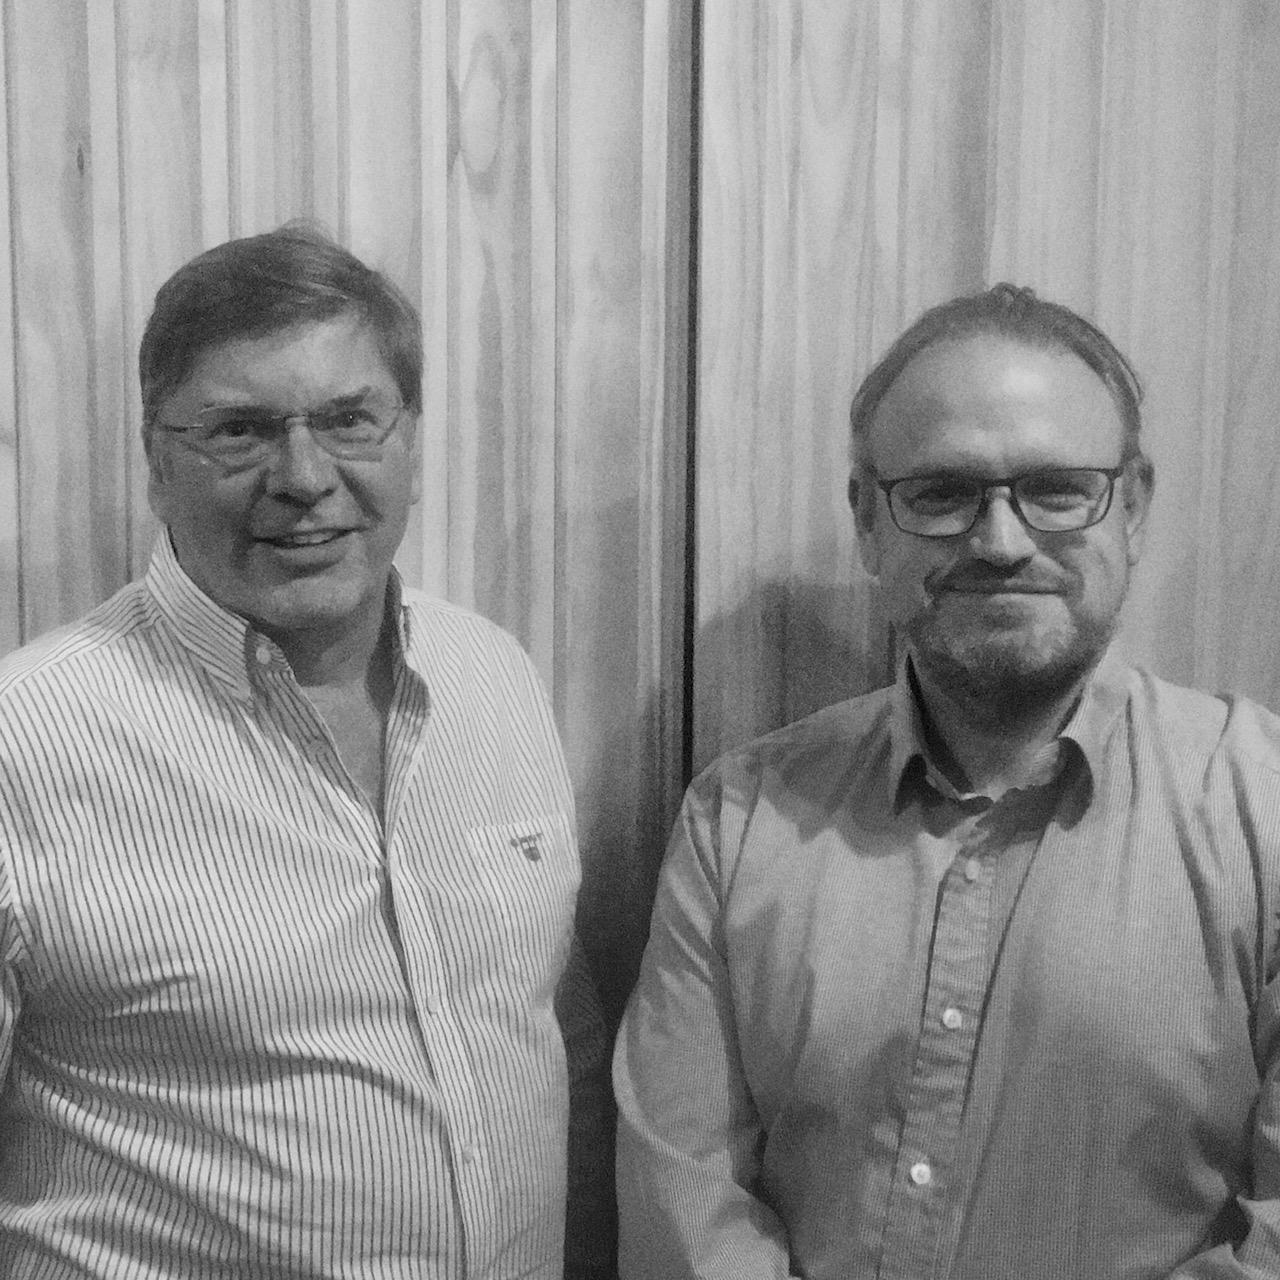 Mr Greg Hoy and Mr Shane Barwood - Melbourne Orthopaedic Group, Victoria, Australia